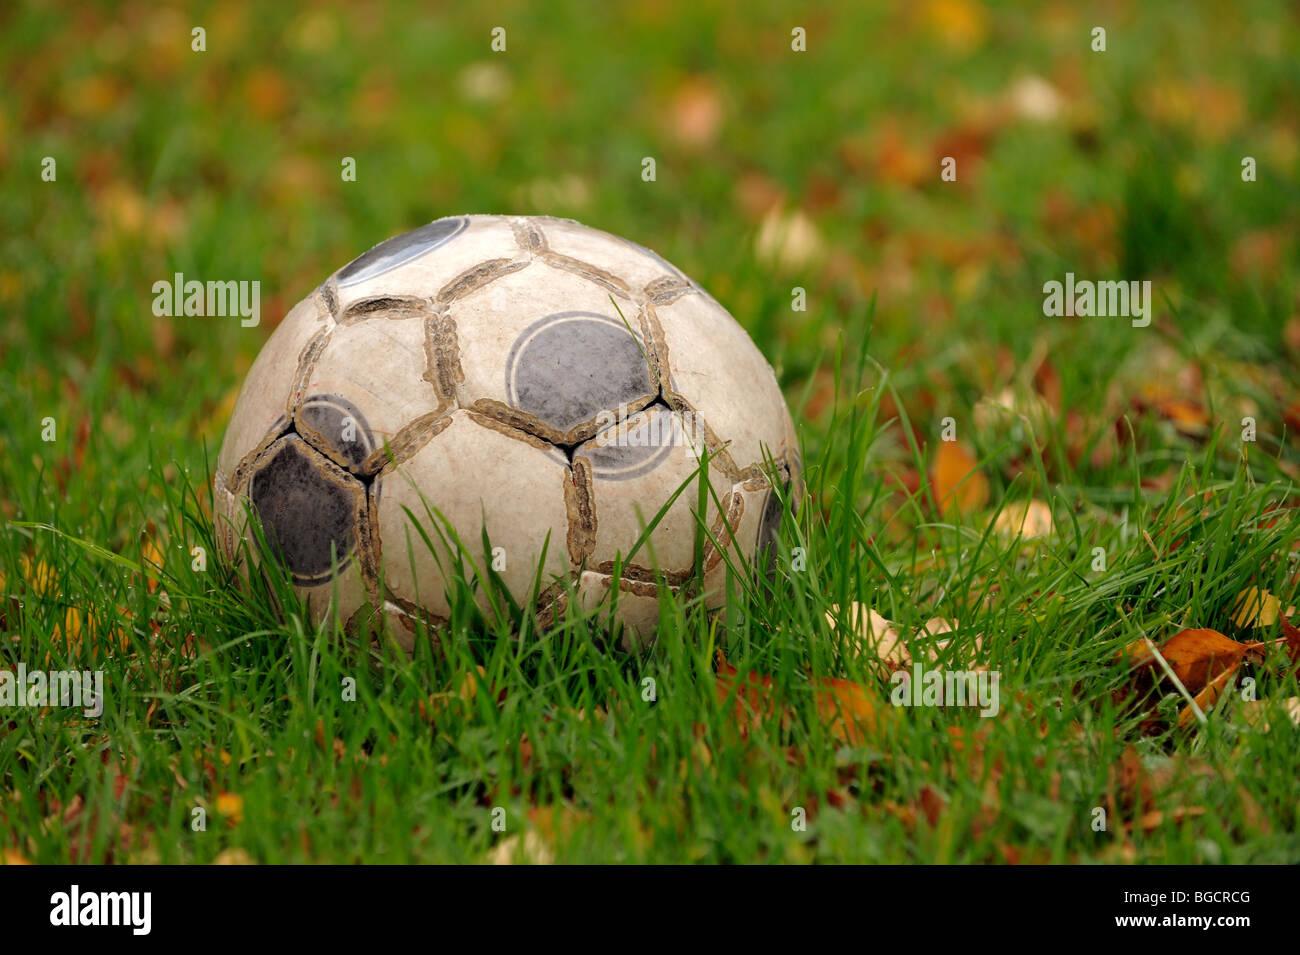 Vecchio calcio in pelle Immagini Stock